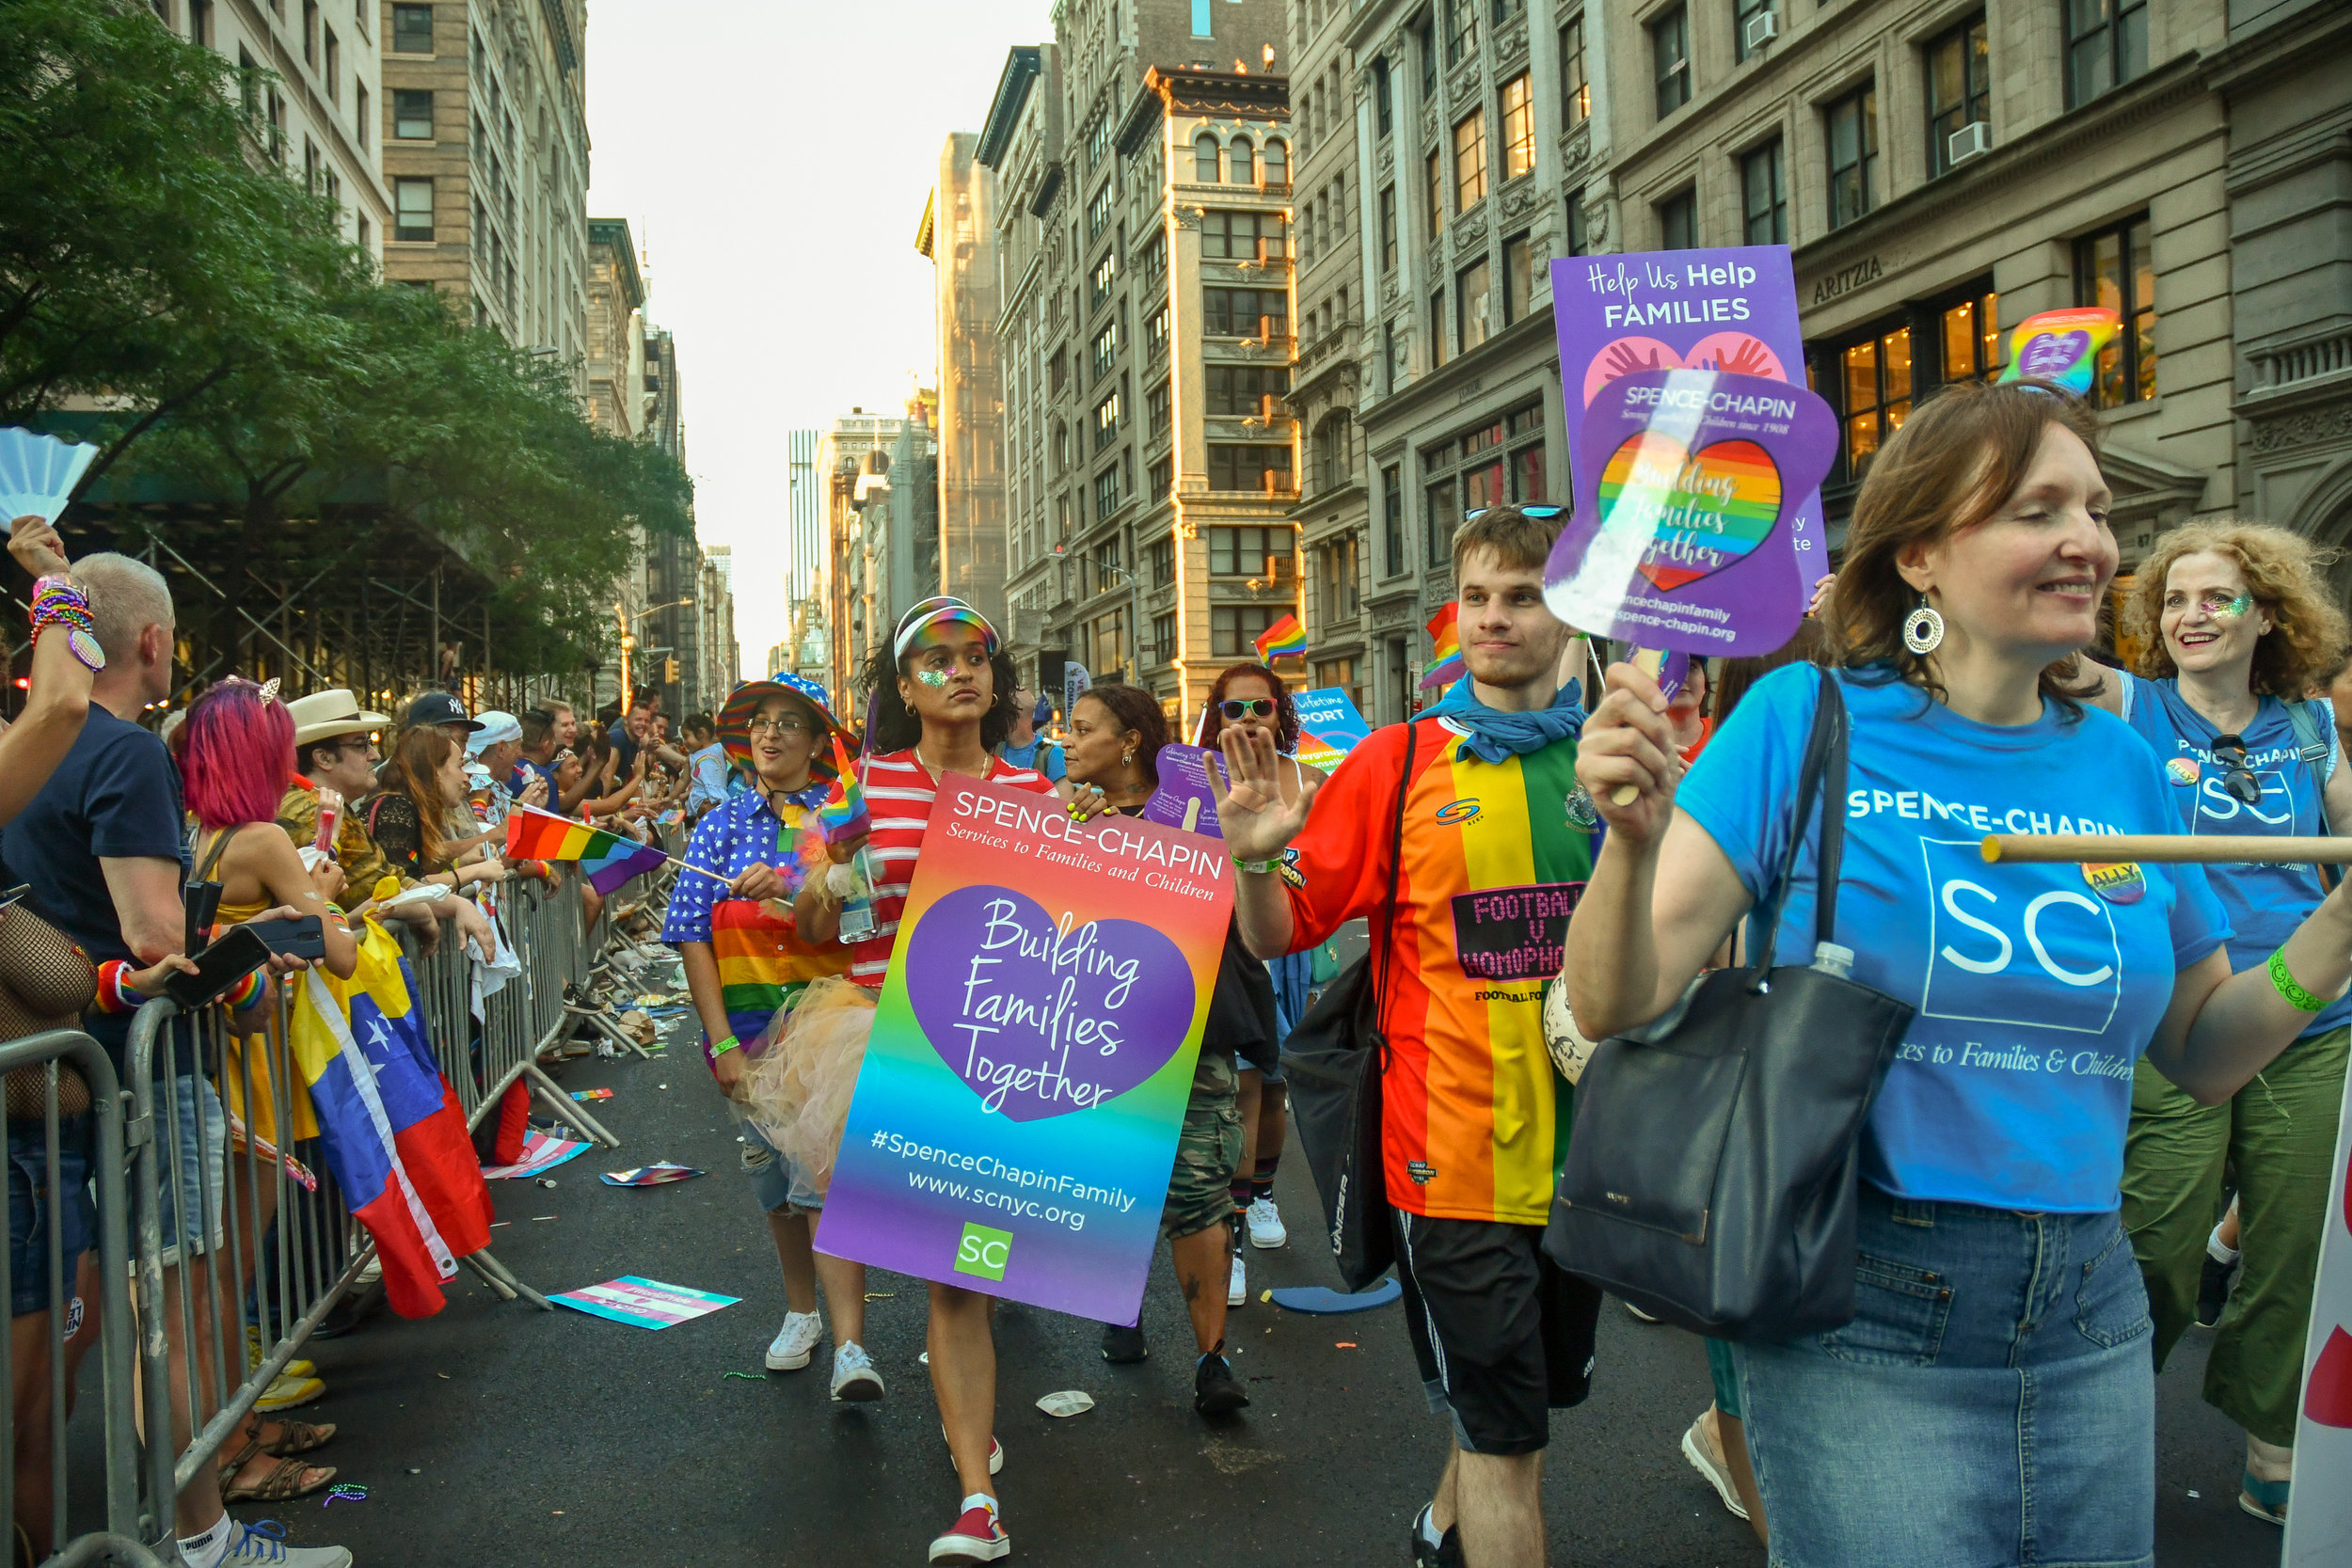 SC-PrideParade-2019_FE-224.jpg